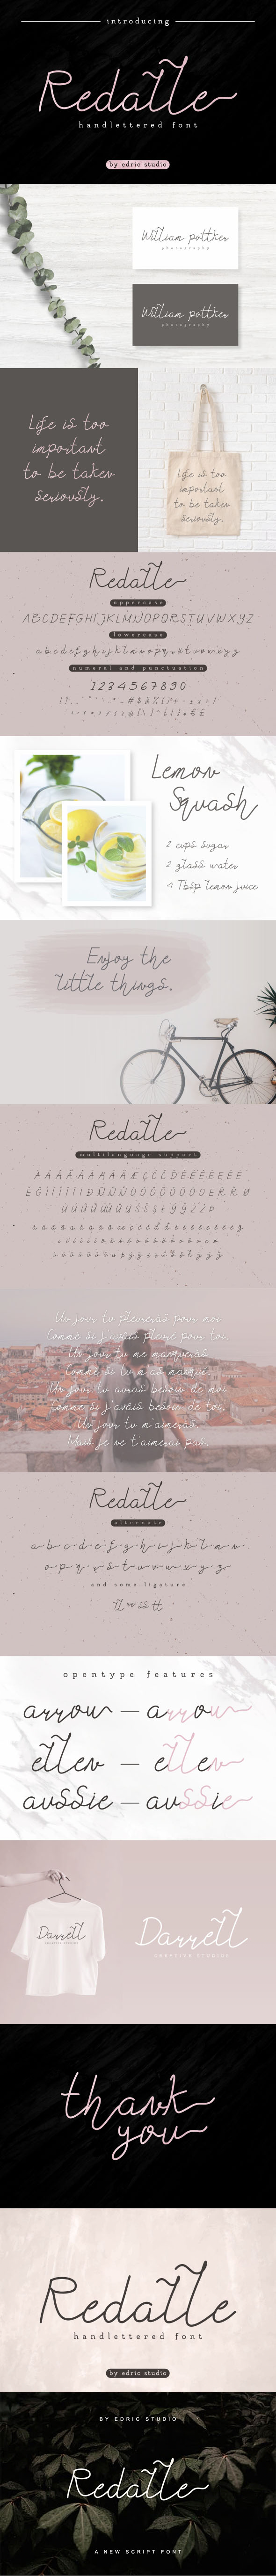 Redalle Monoline Font